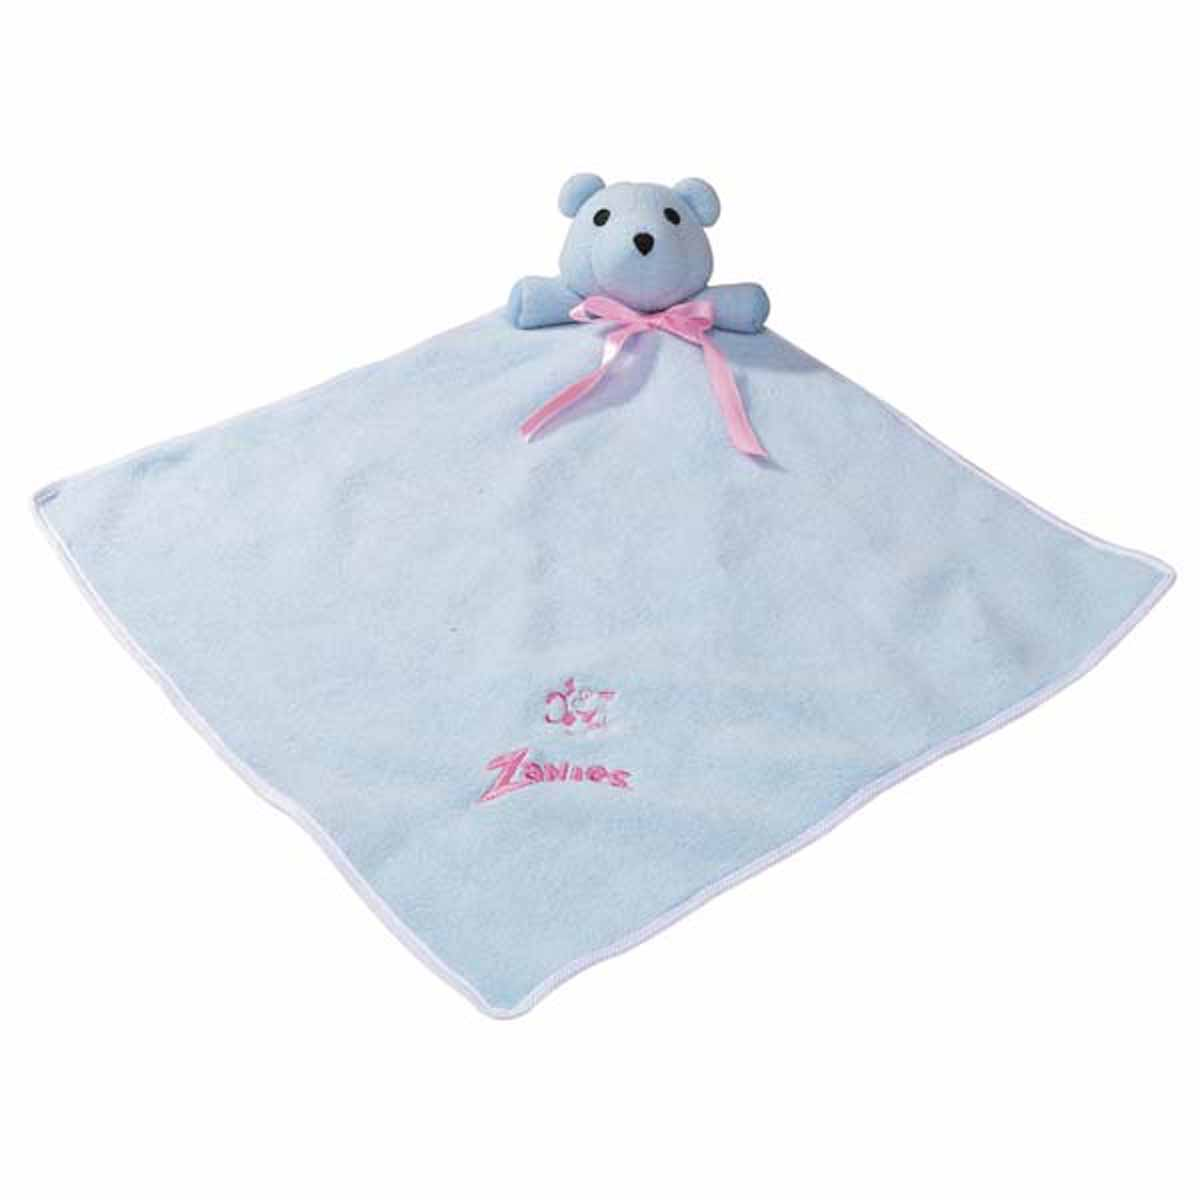 Zanies Snuggle Bear Puppy Blanket - Baby Blue